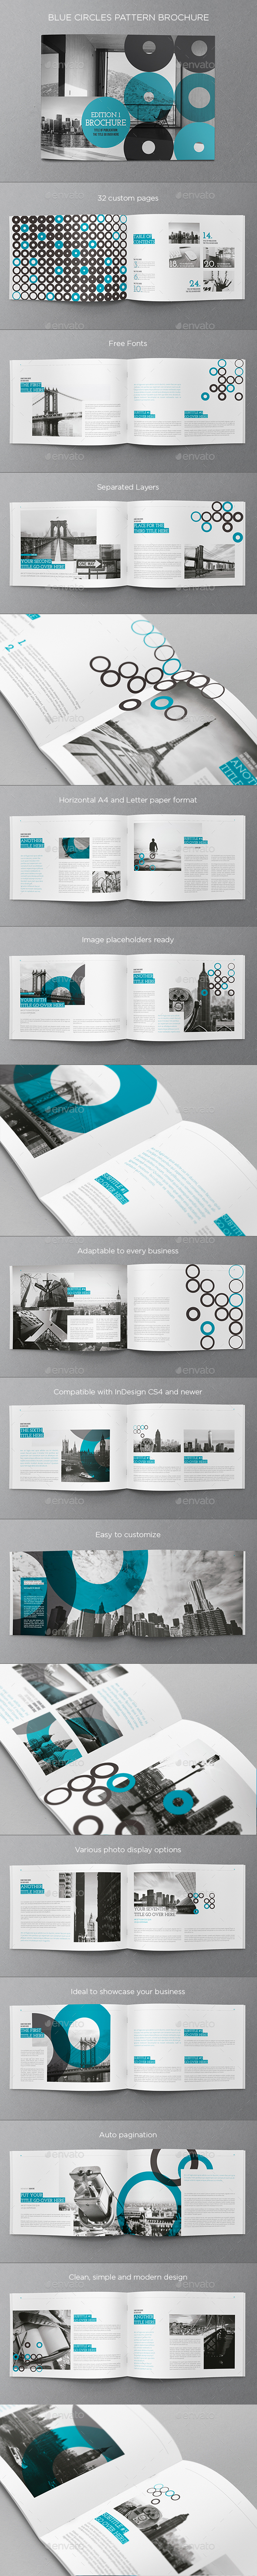 Blue Circles Pattern Brochure - Brochures Print Templates